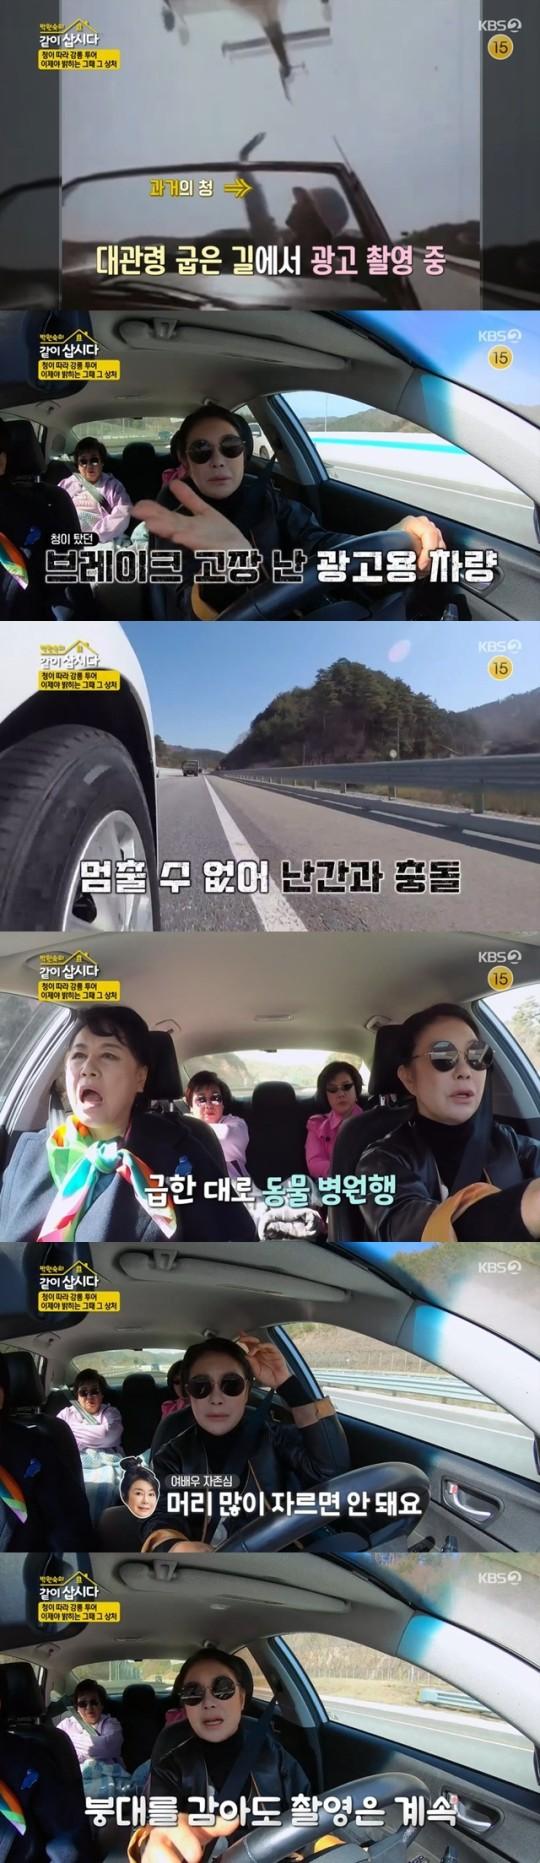 Kim Cheong confieza que tuvo que filmar un comercial luego de chocar